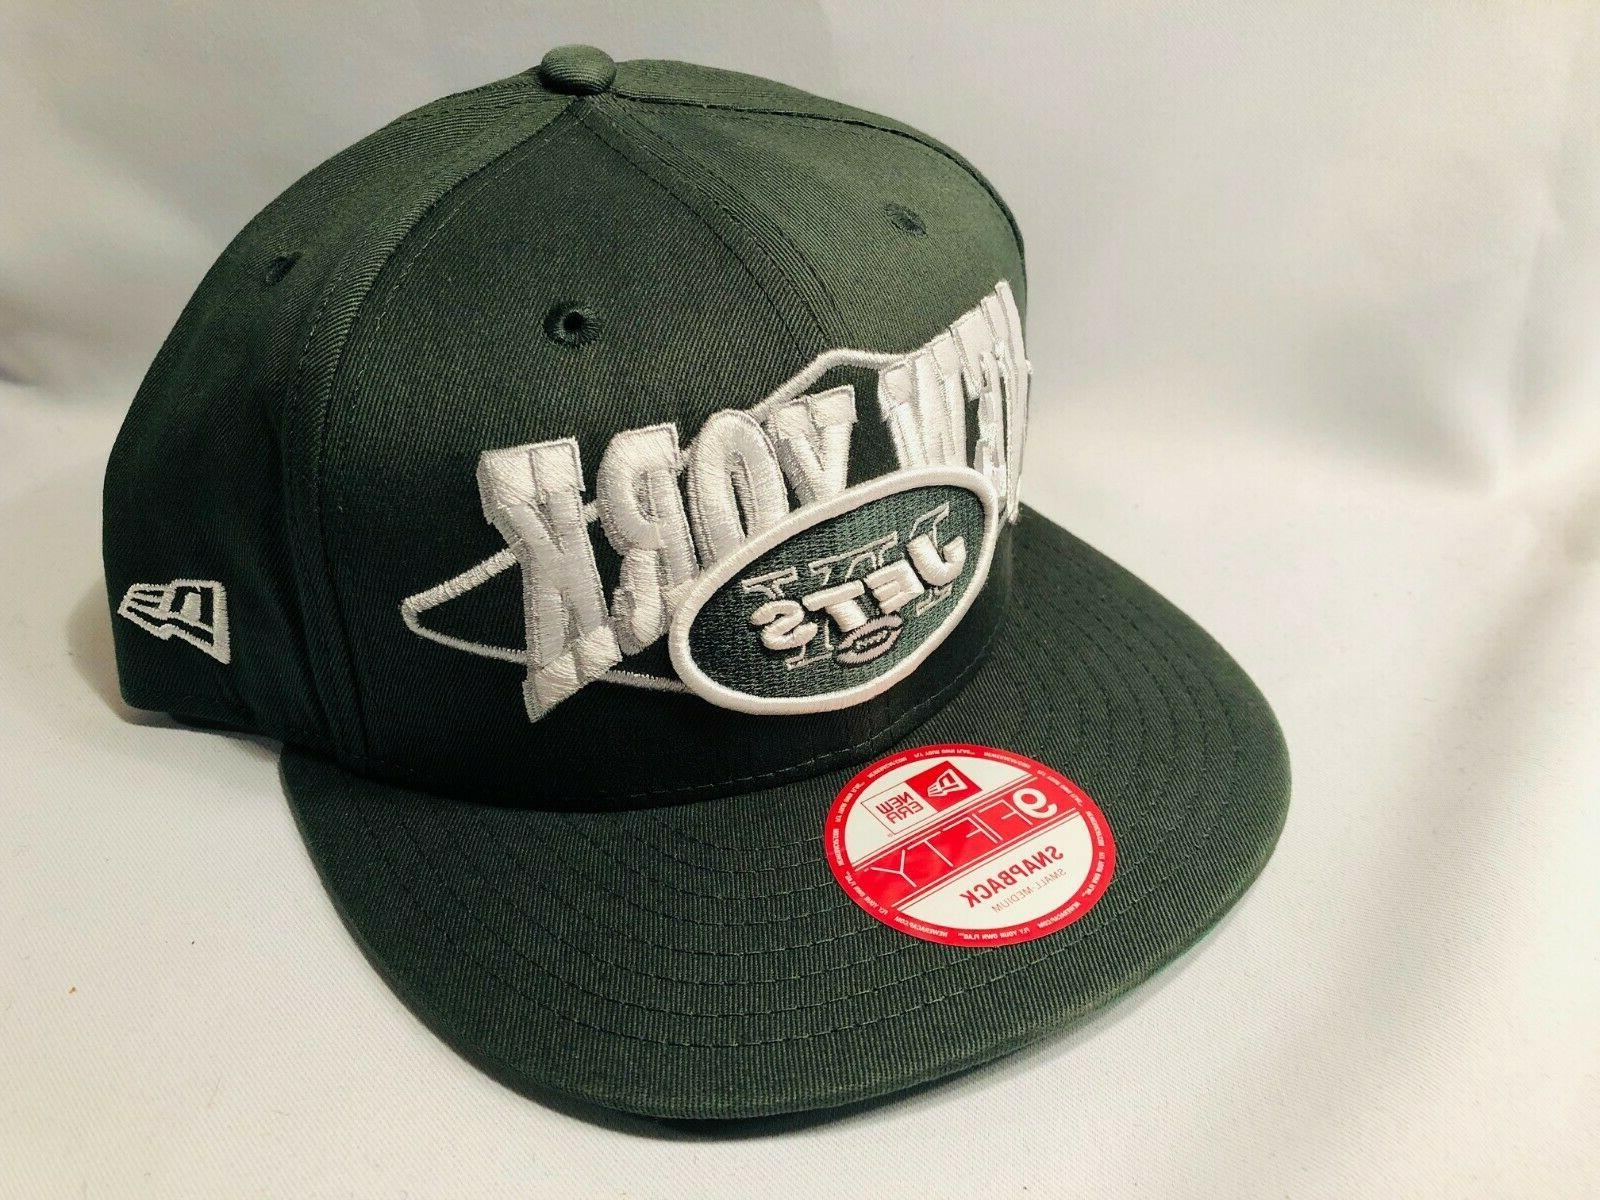 new york jets 9fifty snapback cap hat